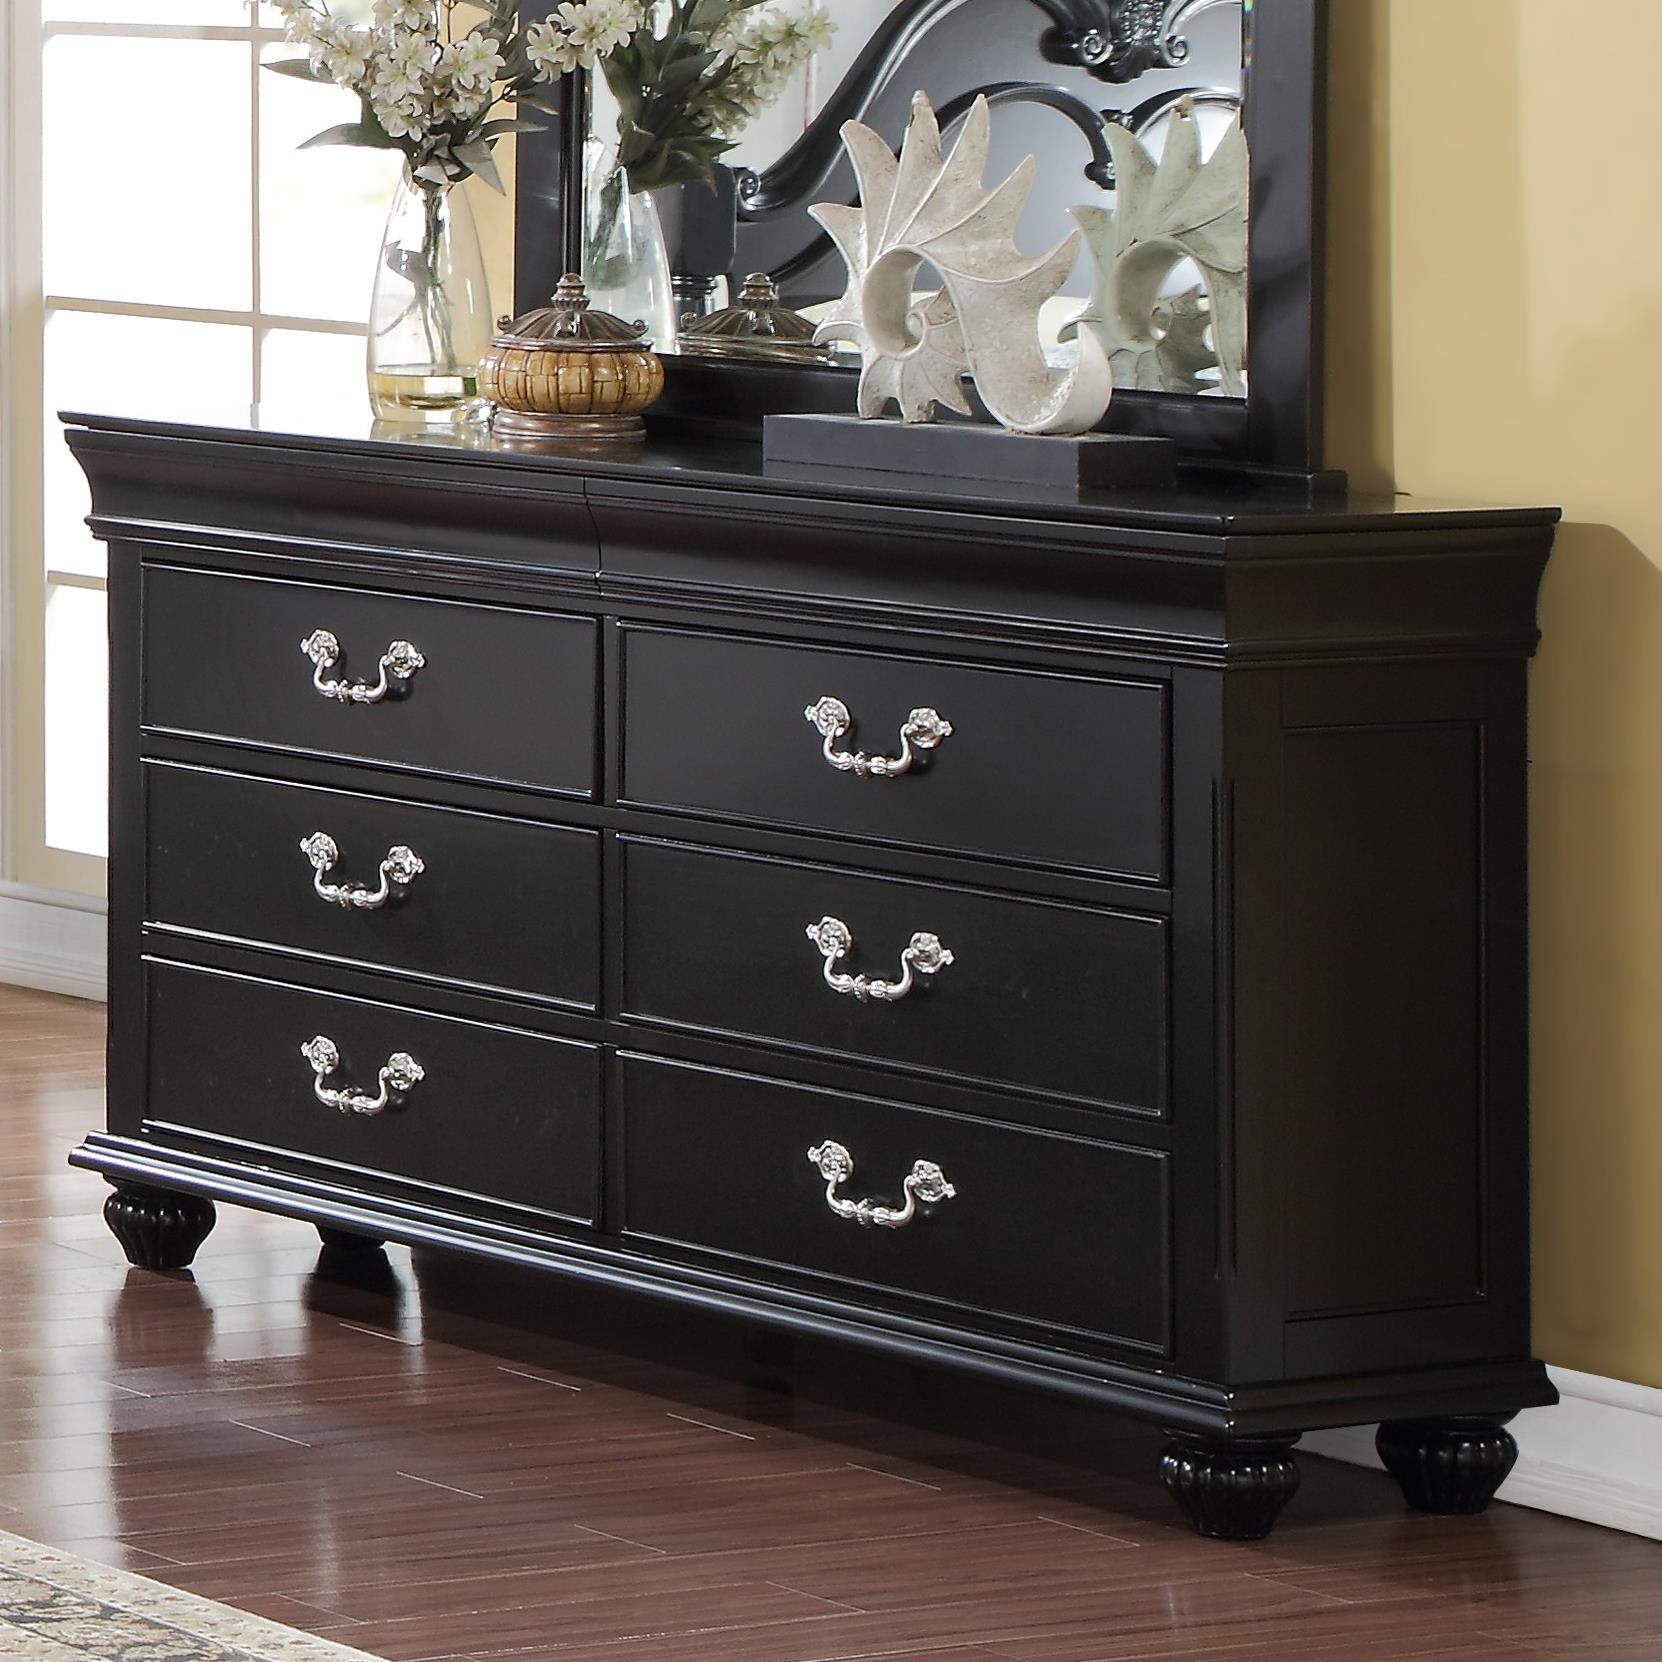 New Classic Jaquelyn 6 Drawer Dresser - Item Number: 00-B8650-050